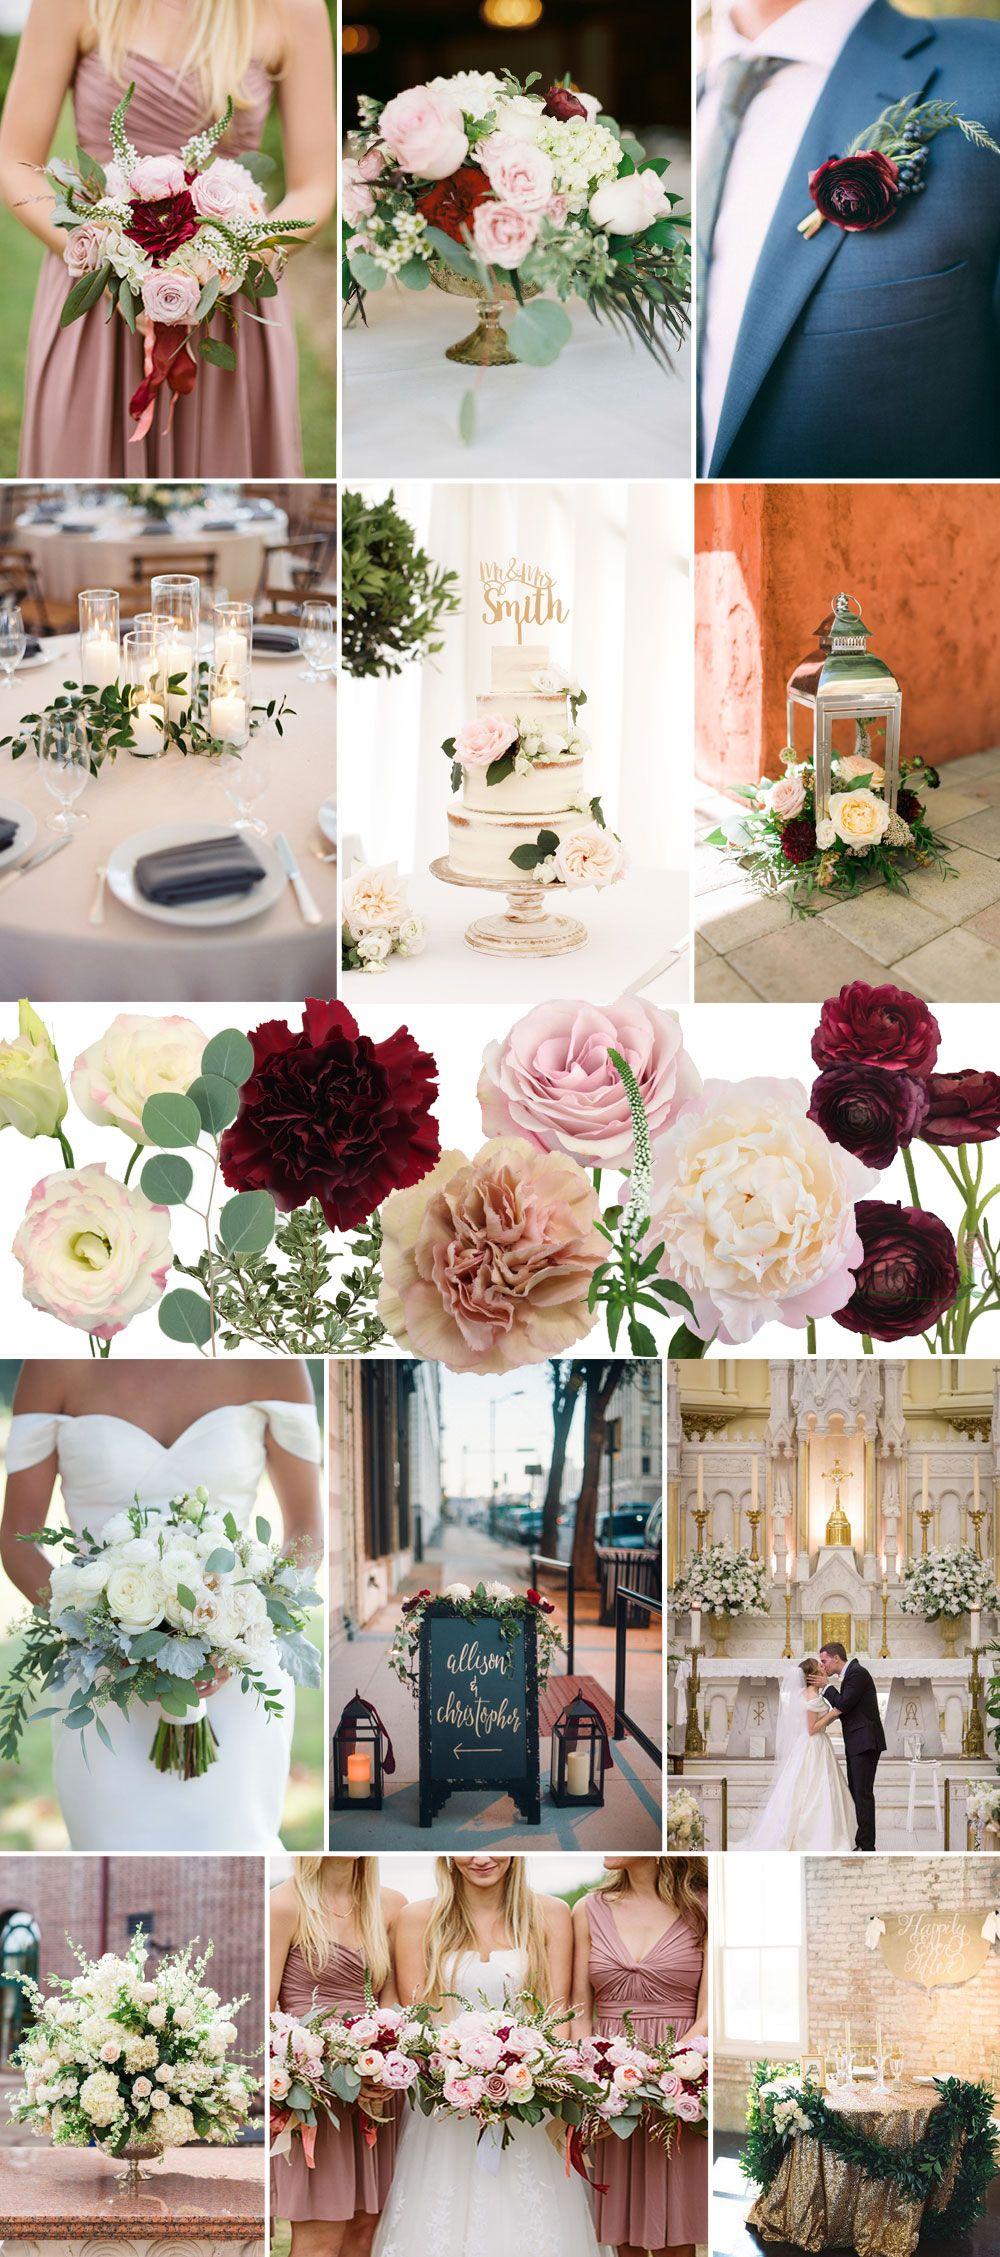 My Wedding The Inspiration for My Romantic Spring Wedding